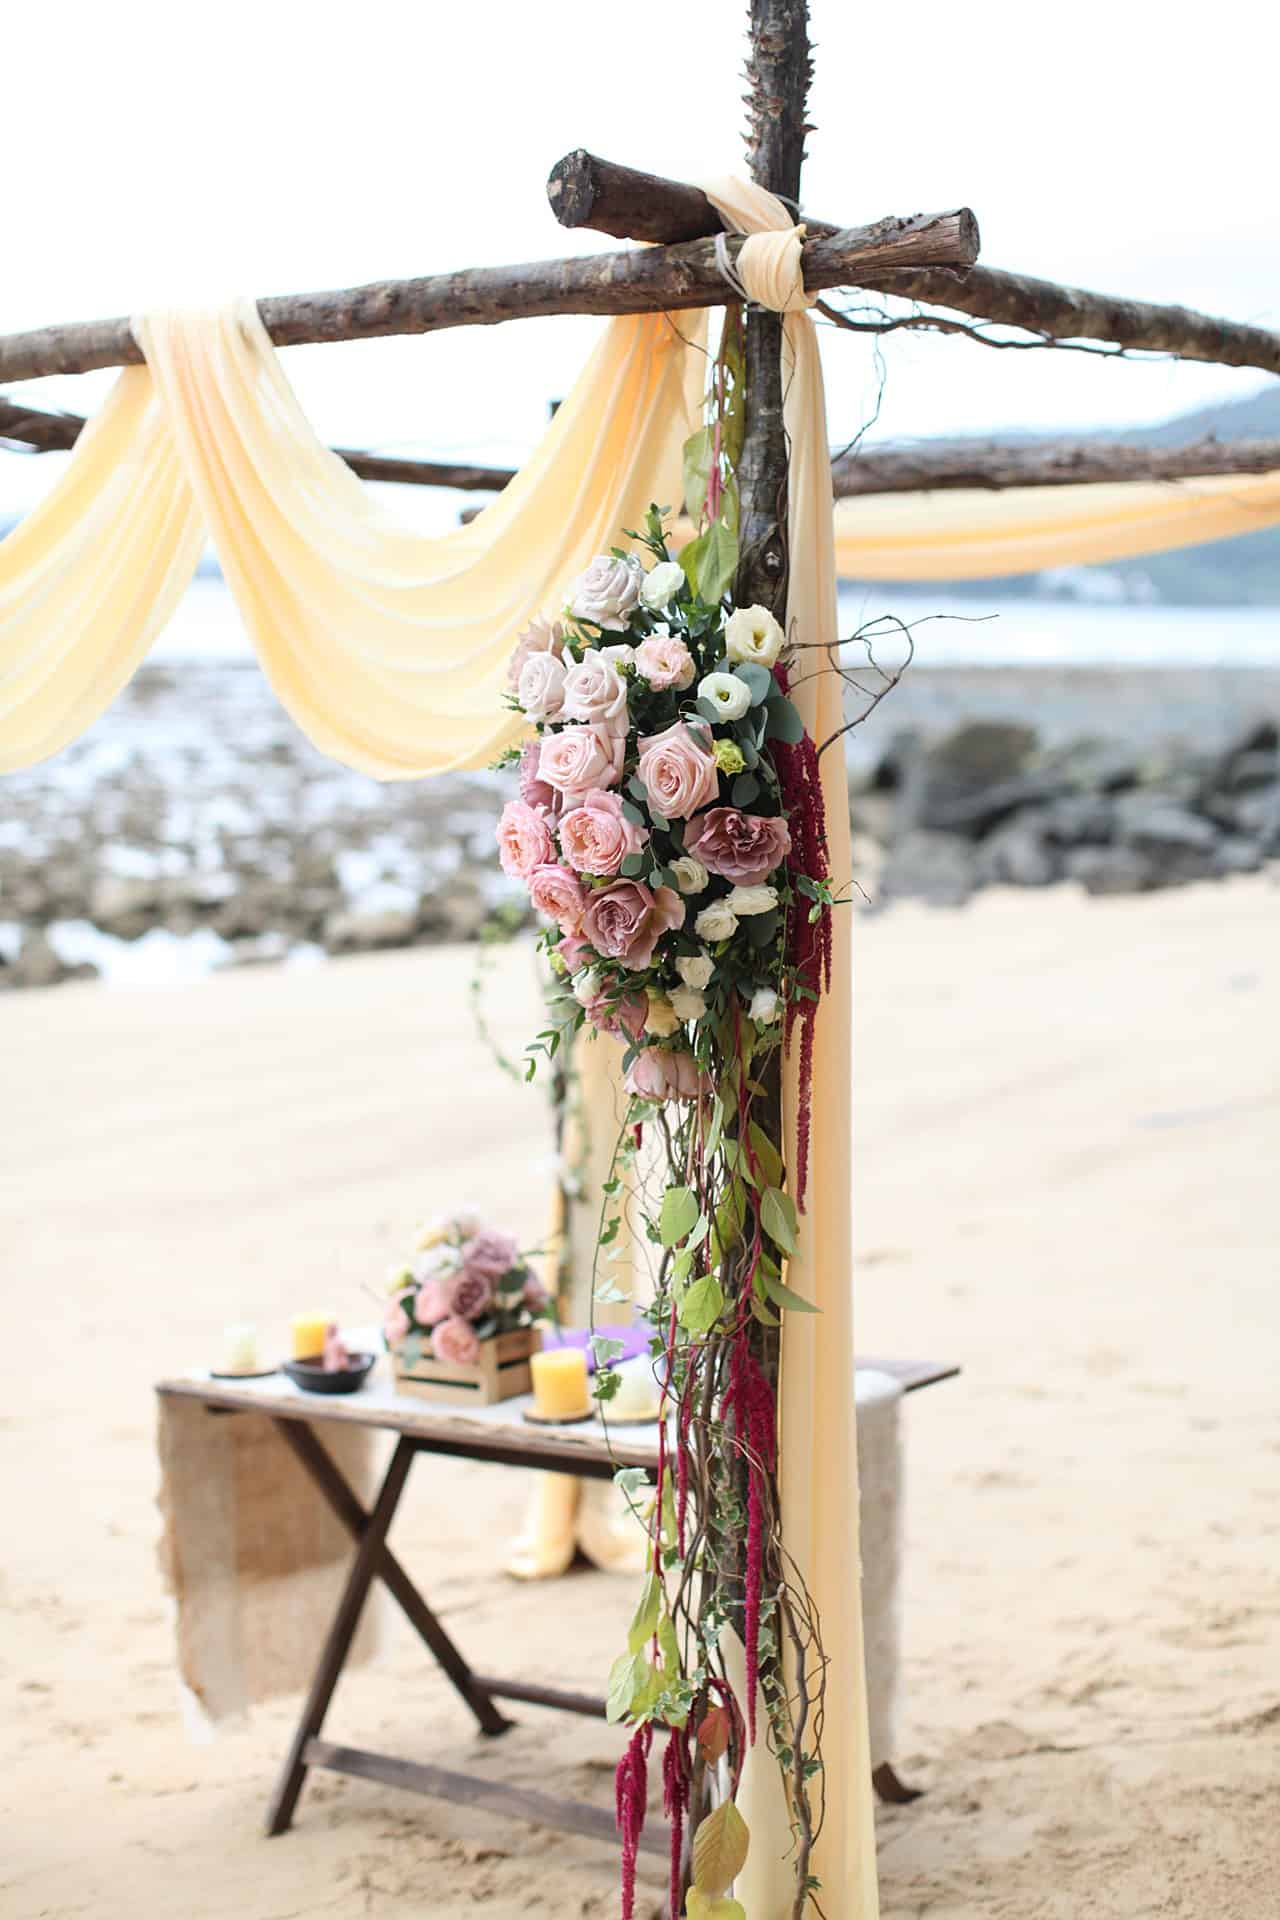 Rustic Weddings Ideas 9